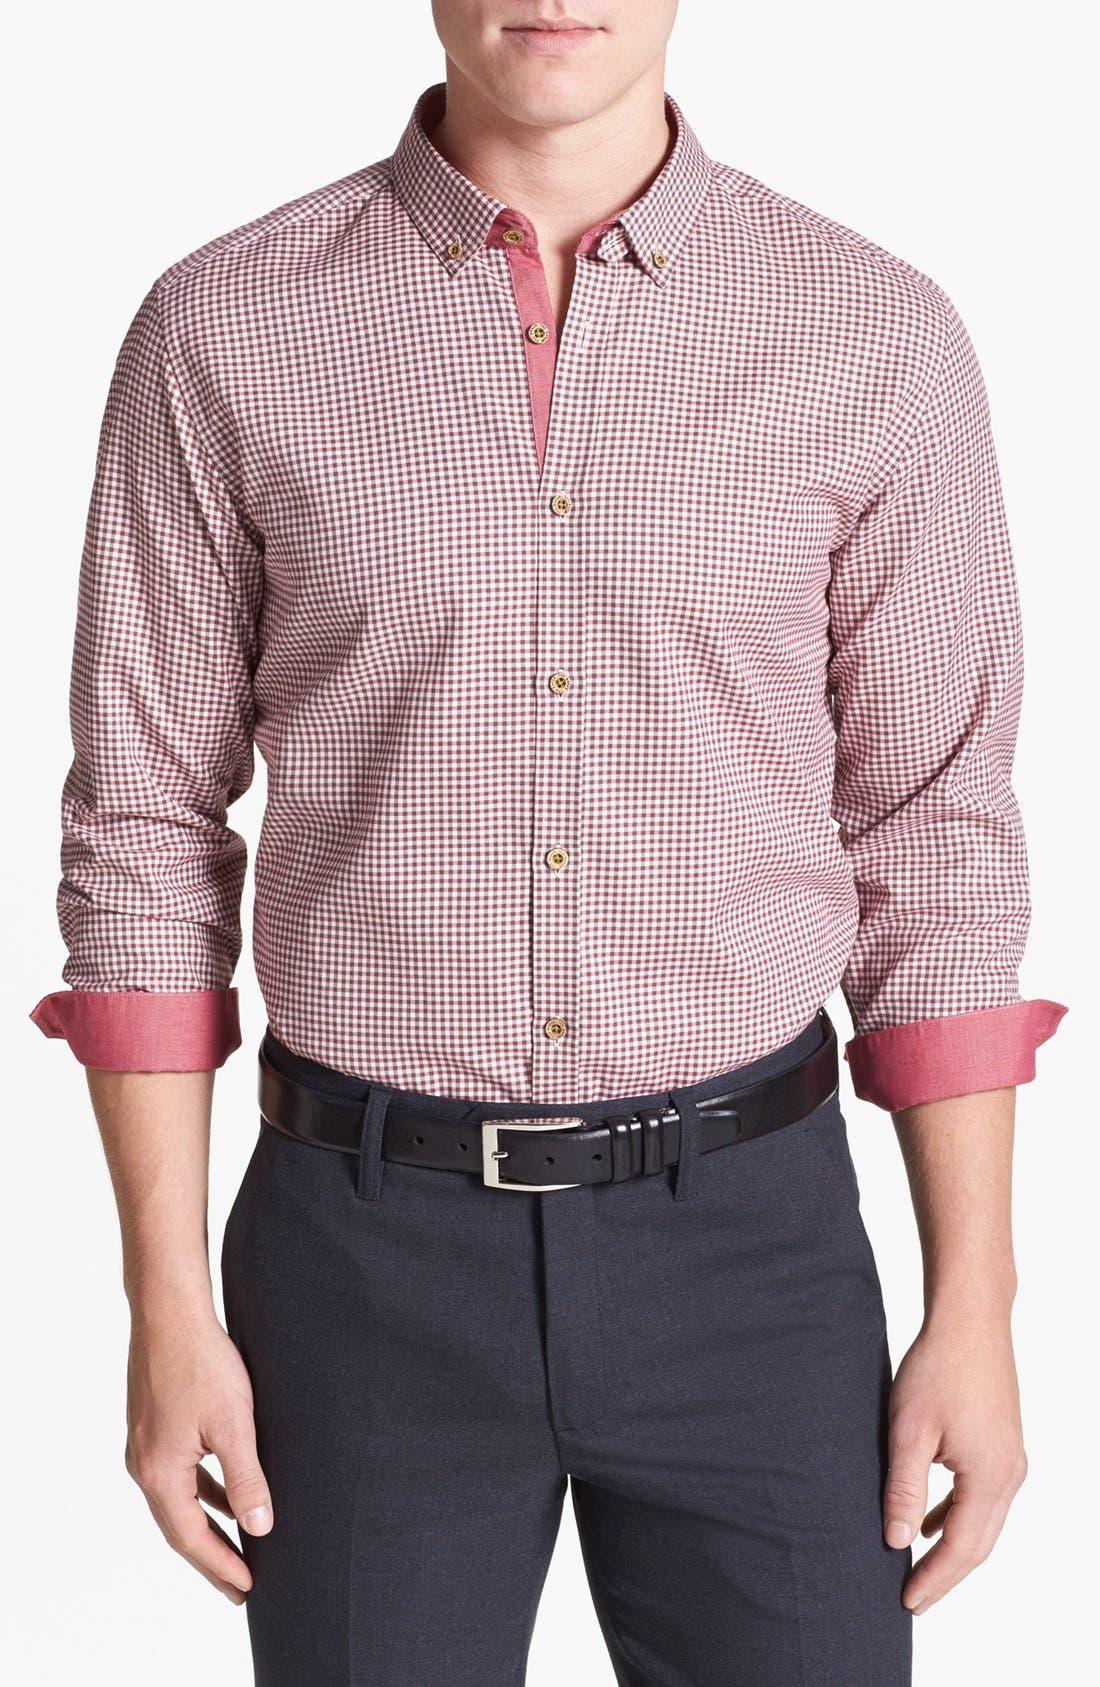 Alternate Image 1 Selected - Ted Baker London 'Flannew' Flannel Trim Sport Shirt